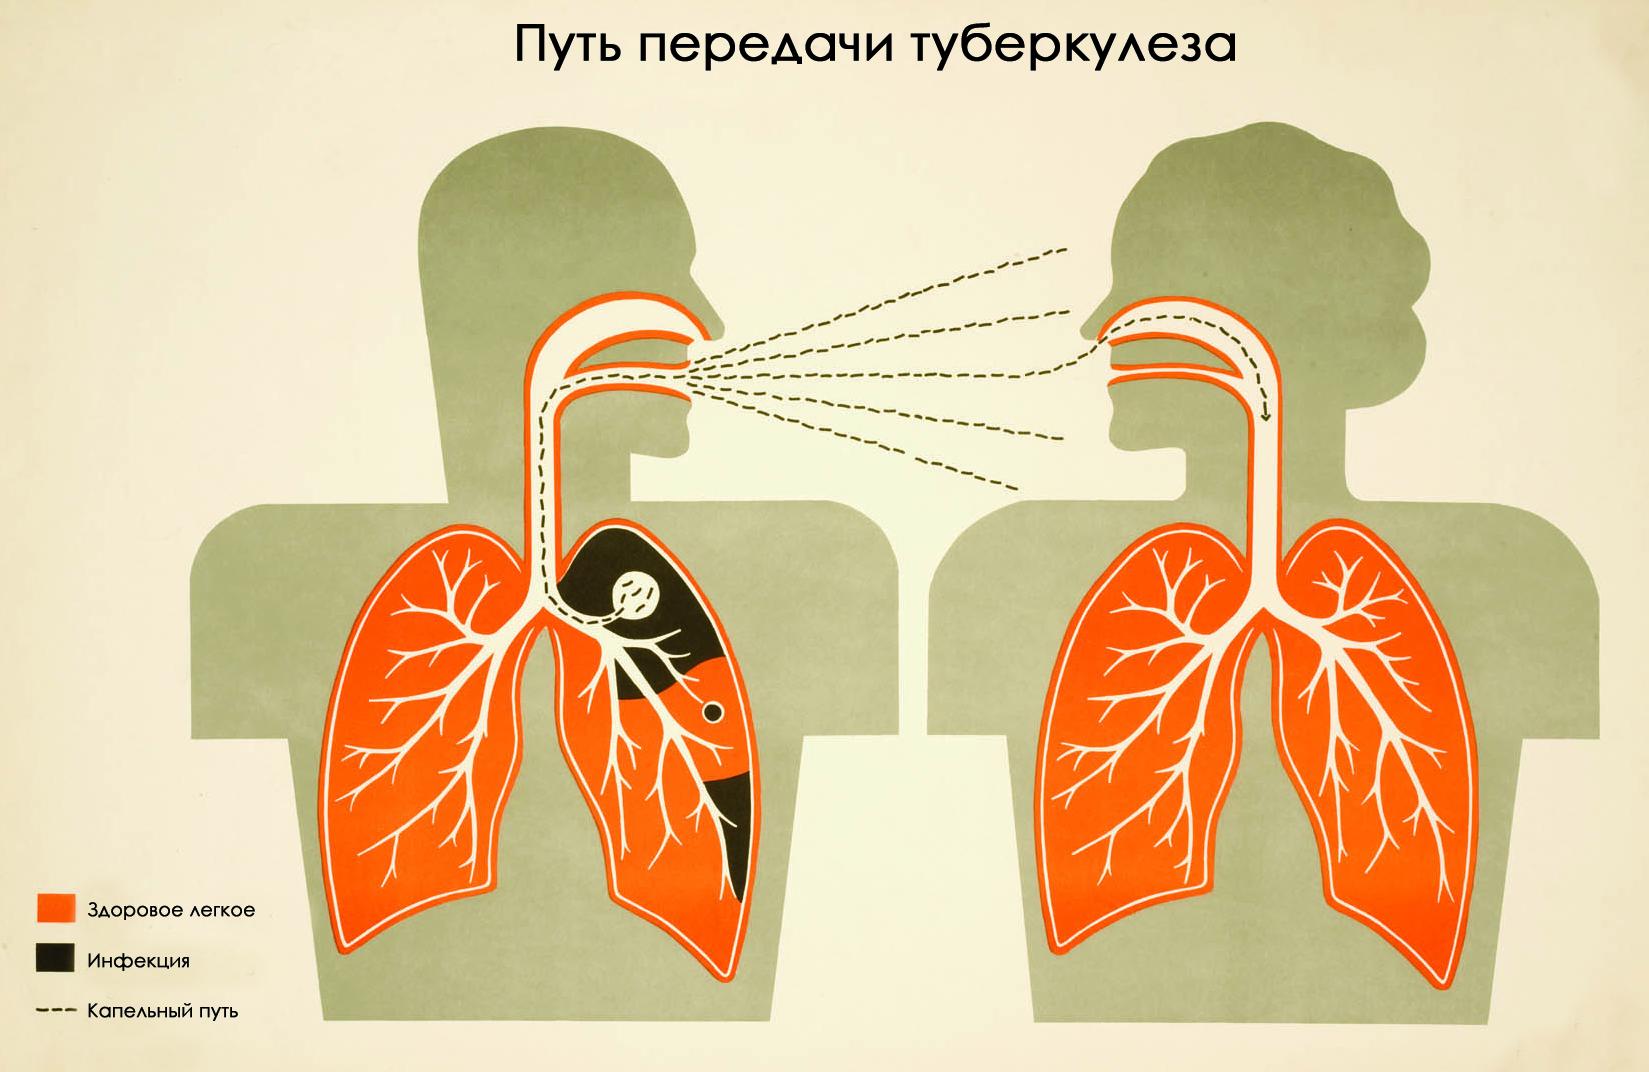 Ранние признаки туберкулеза